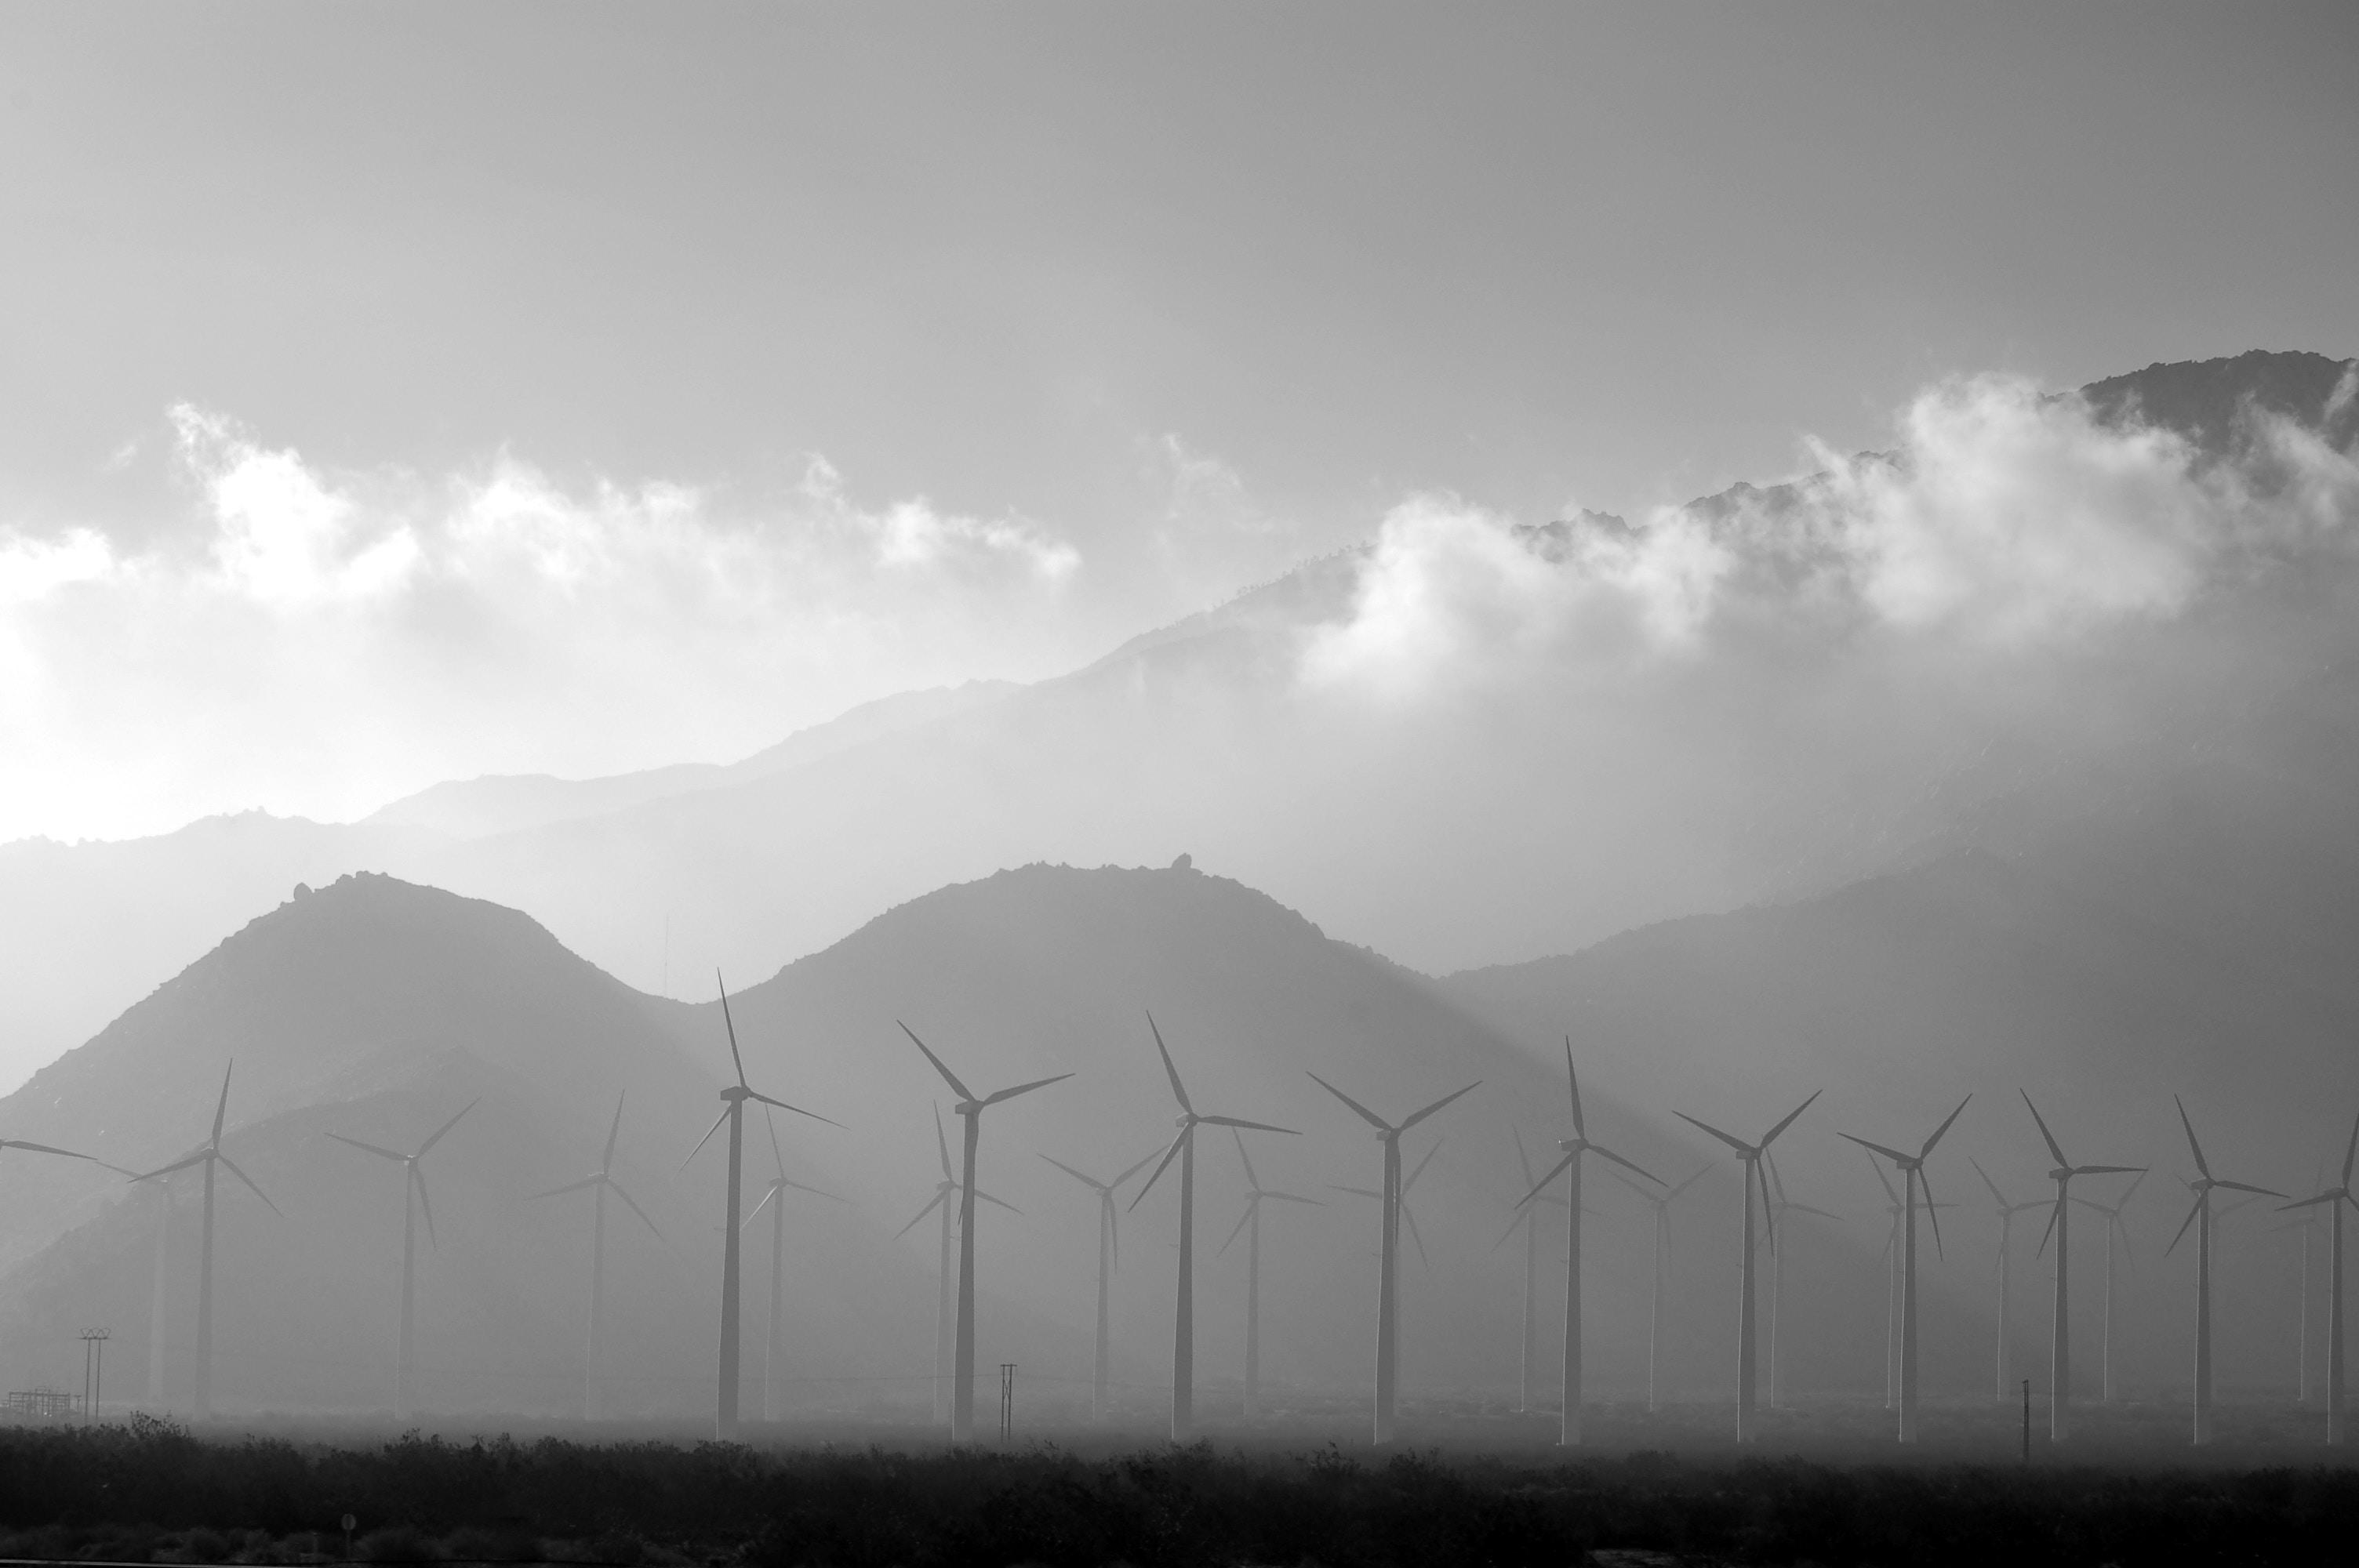 wind turbine near mountains